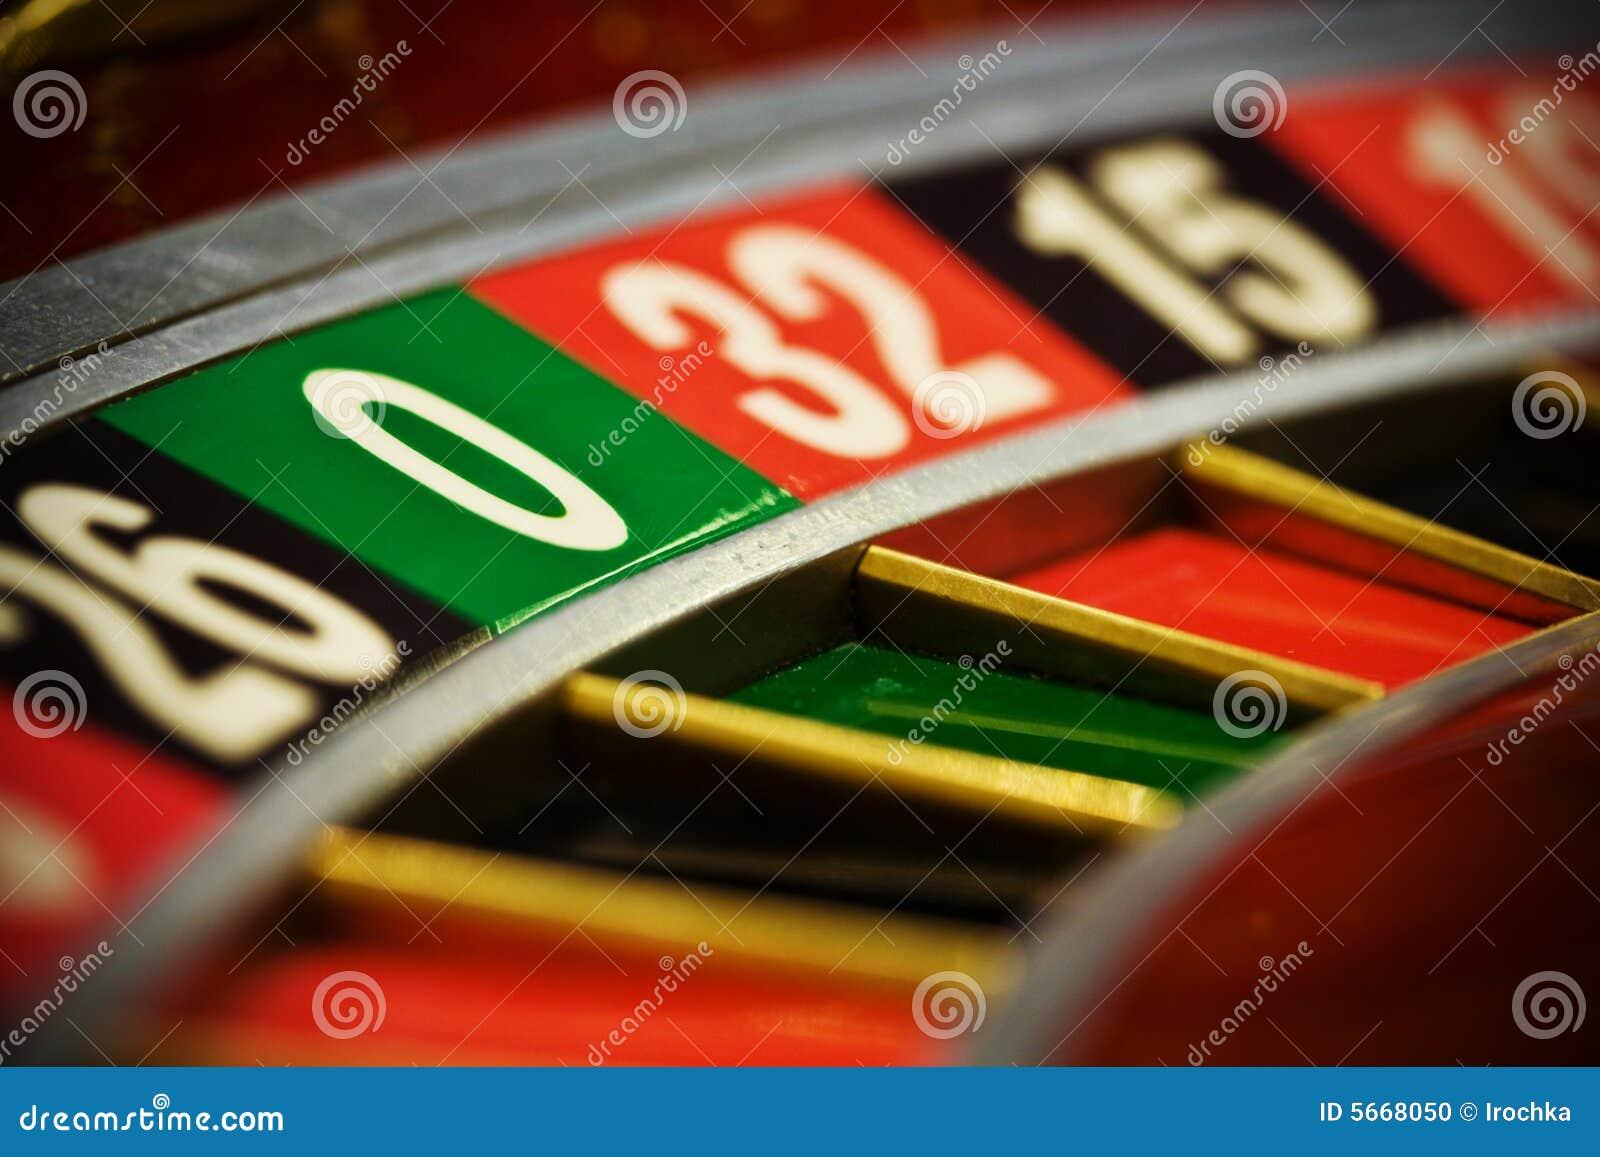 casino las vegas online spielautomat